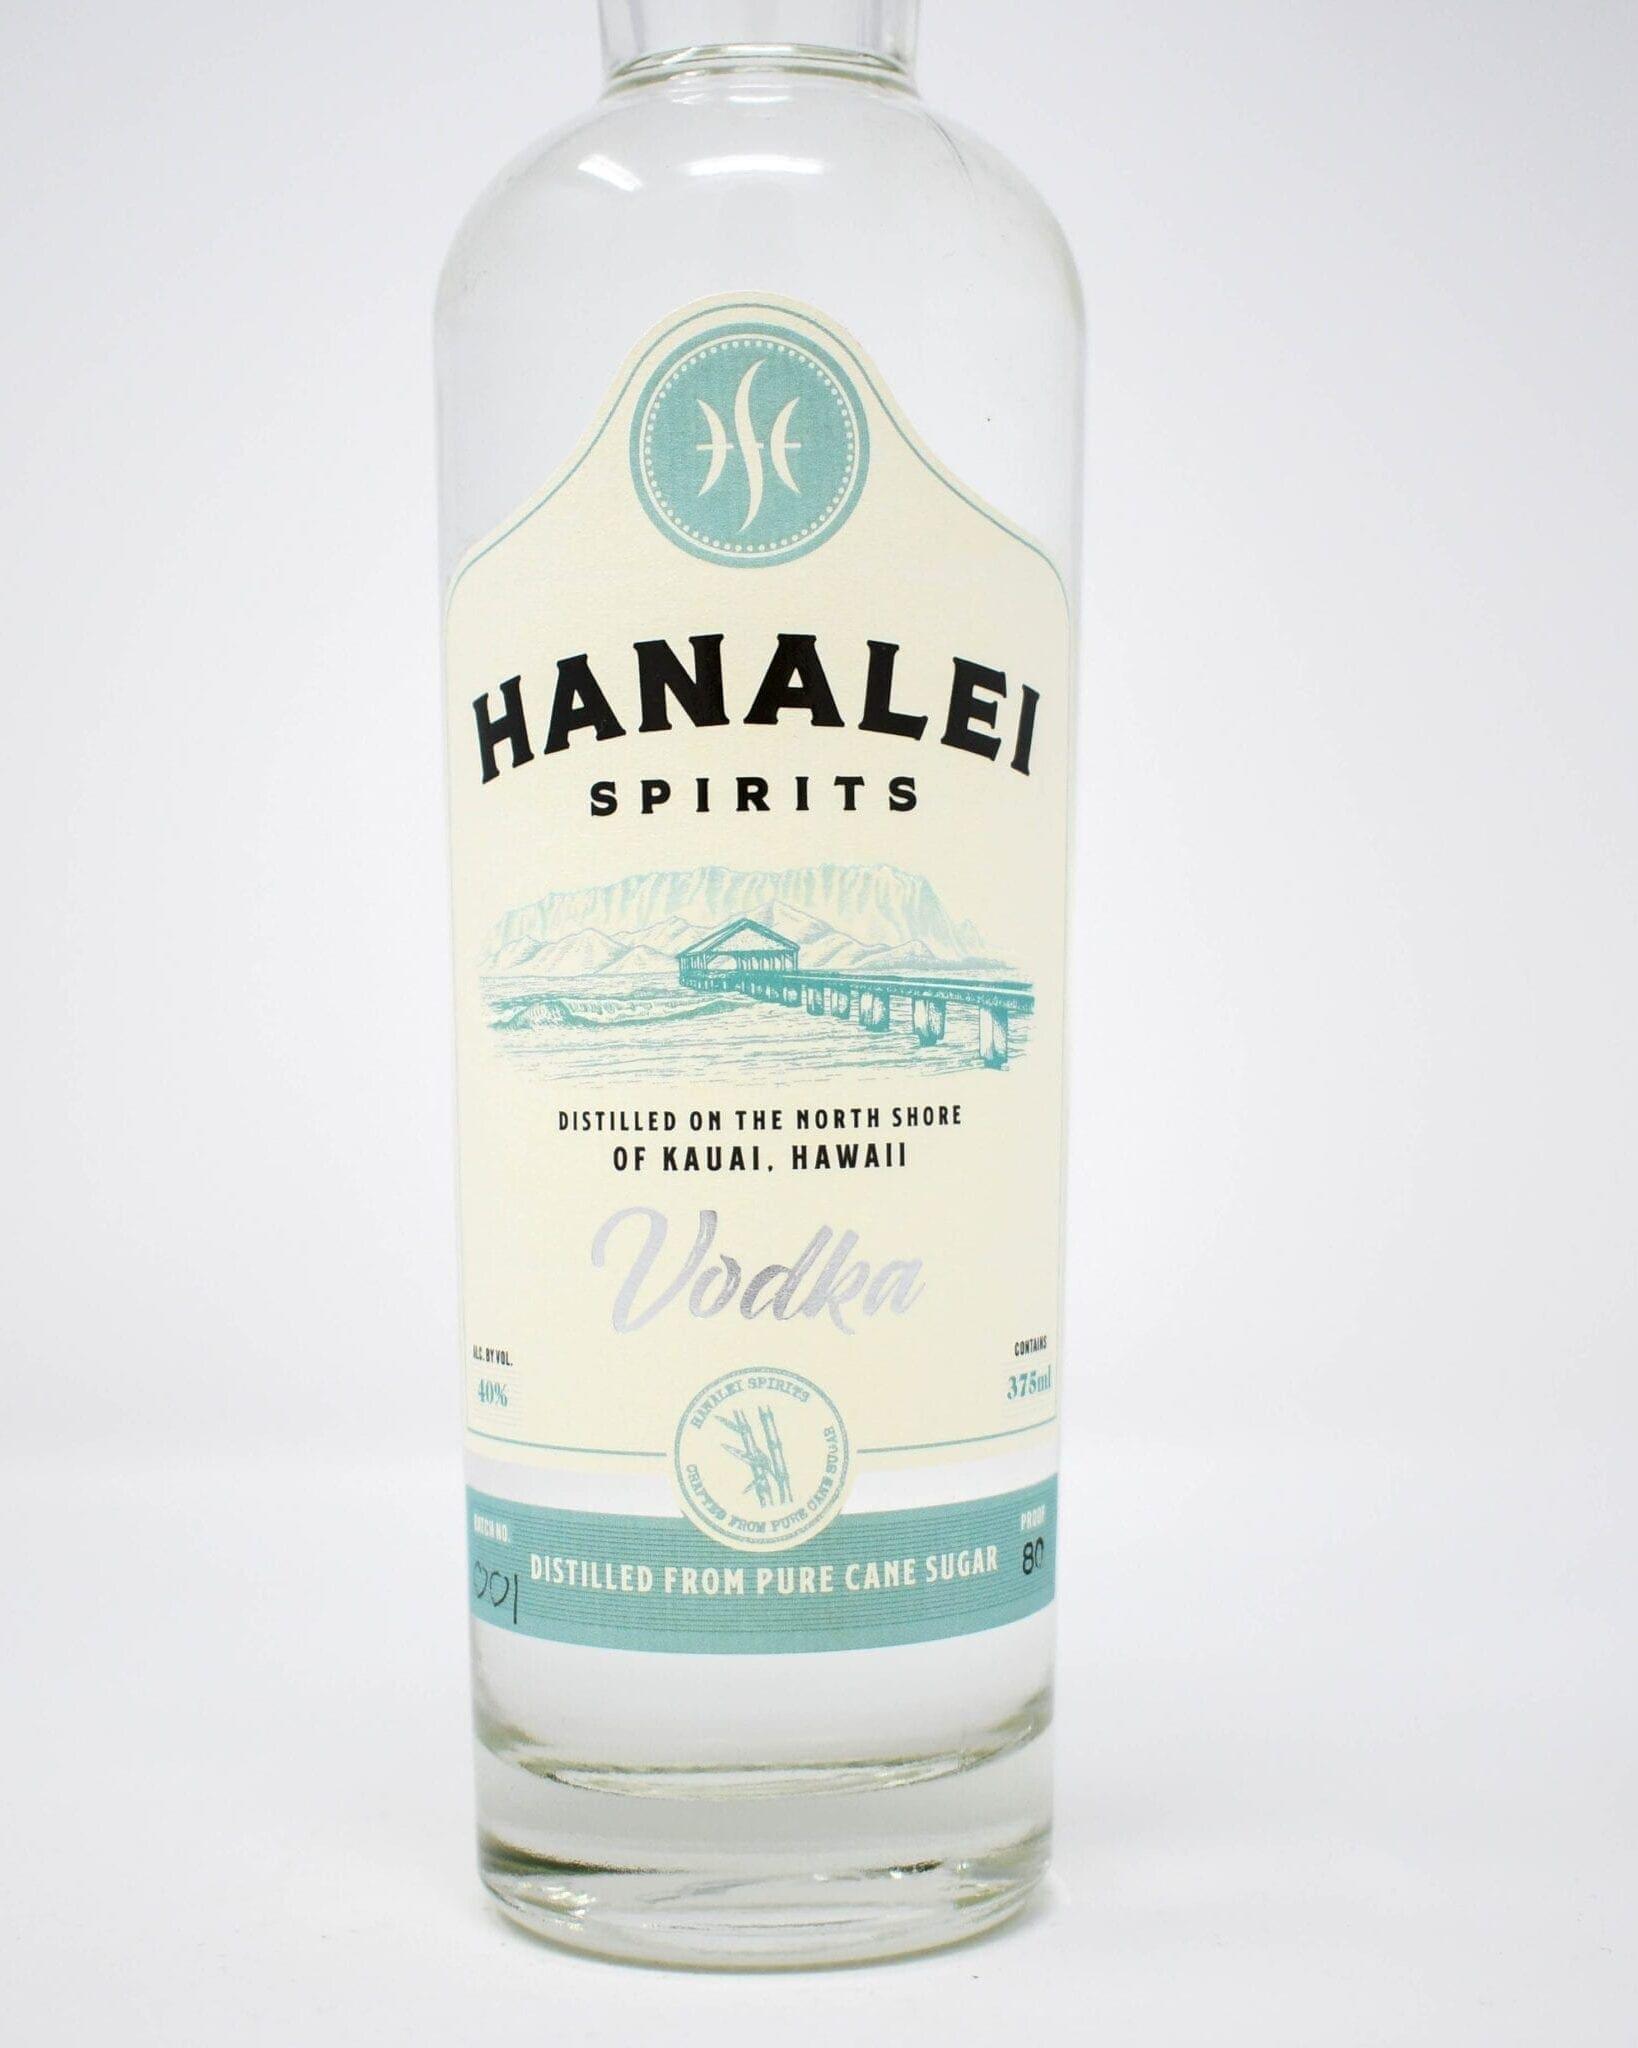 Hanalei Spirits Vodka 375ml